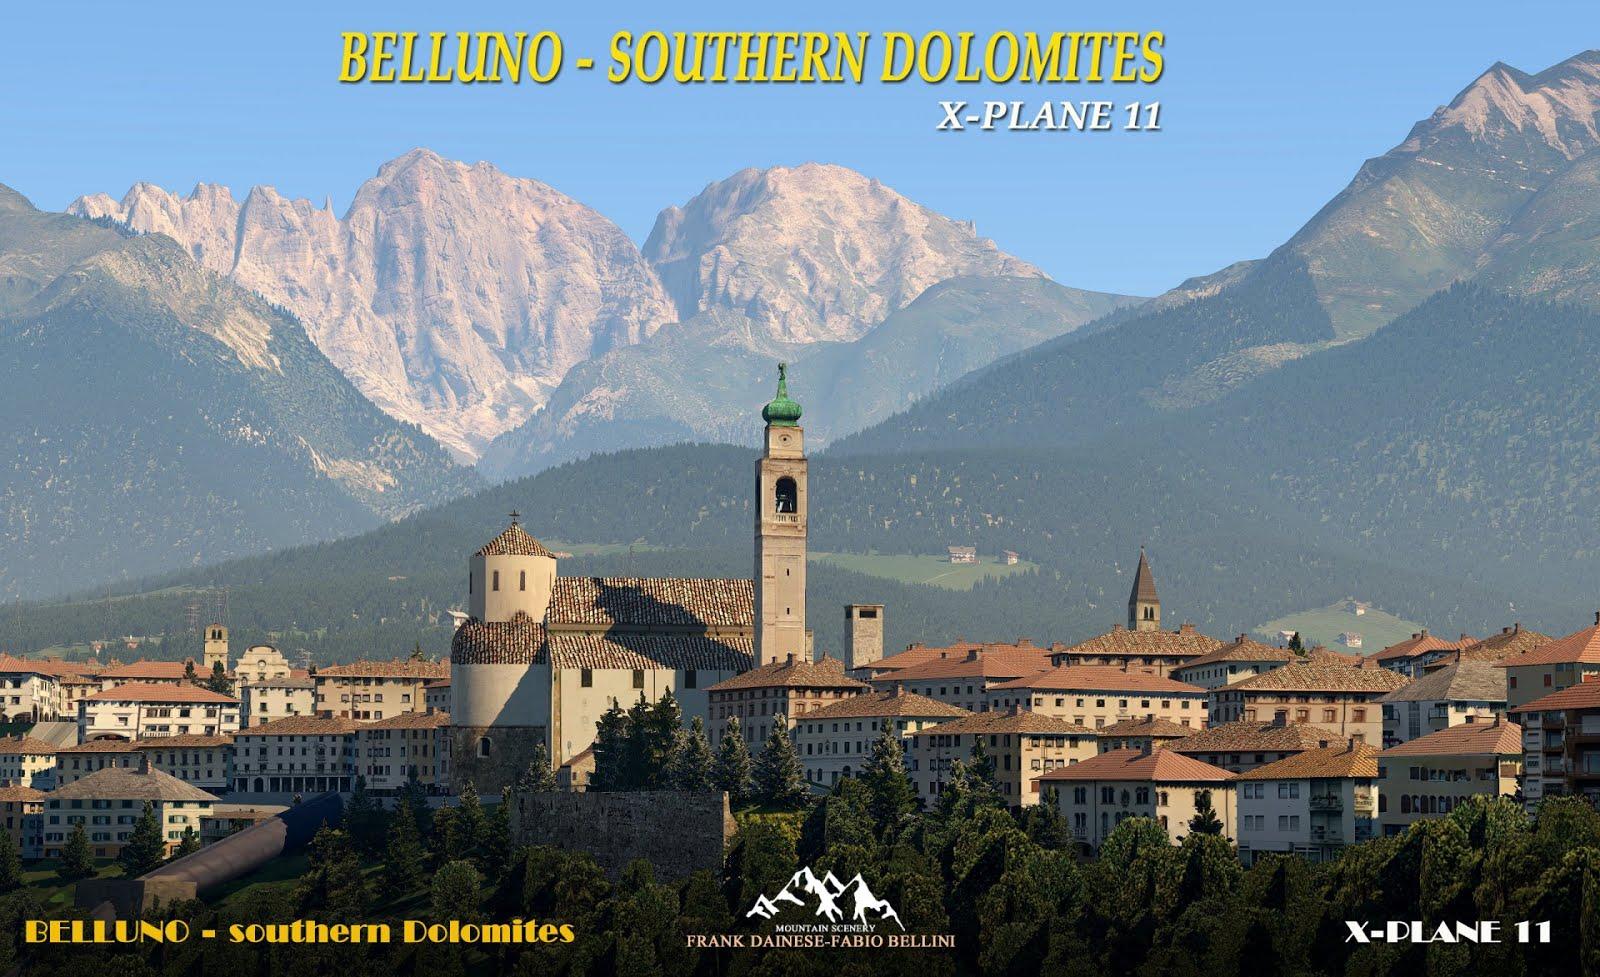 BELLUNO - SOUTHERN DOLOMITES